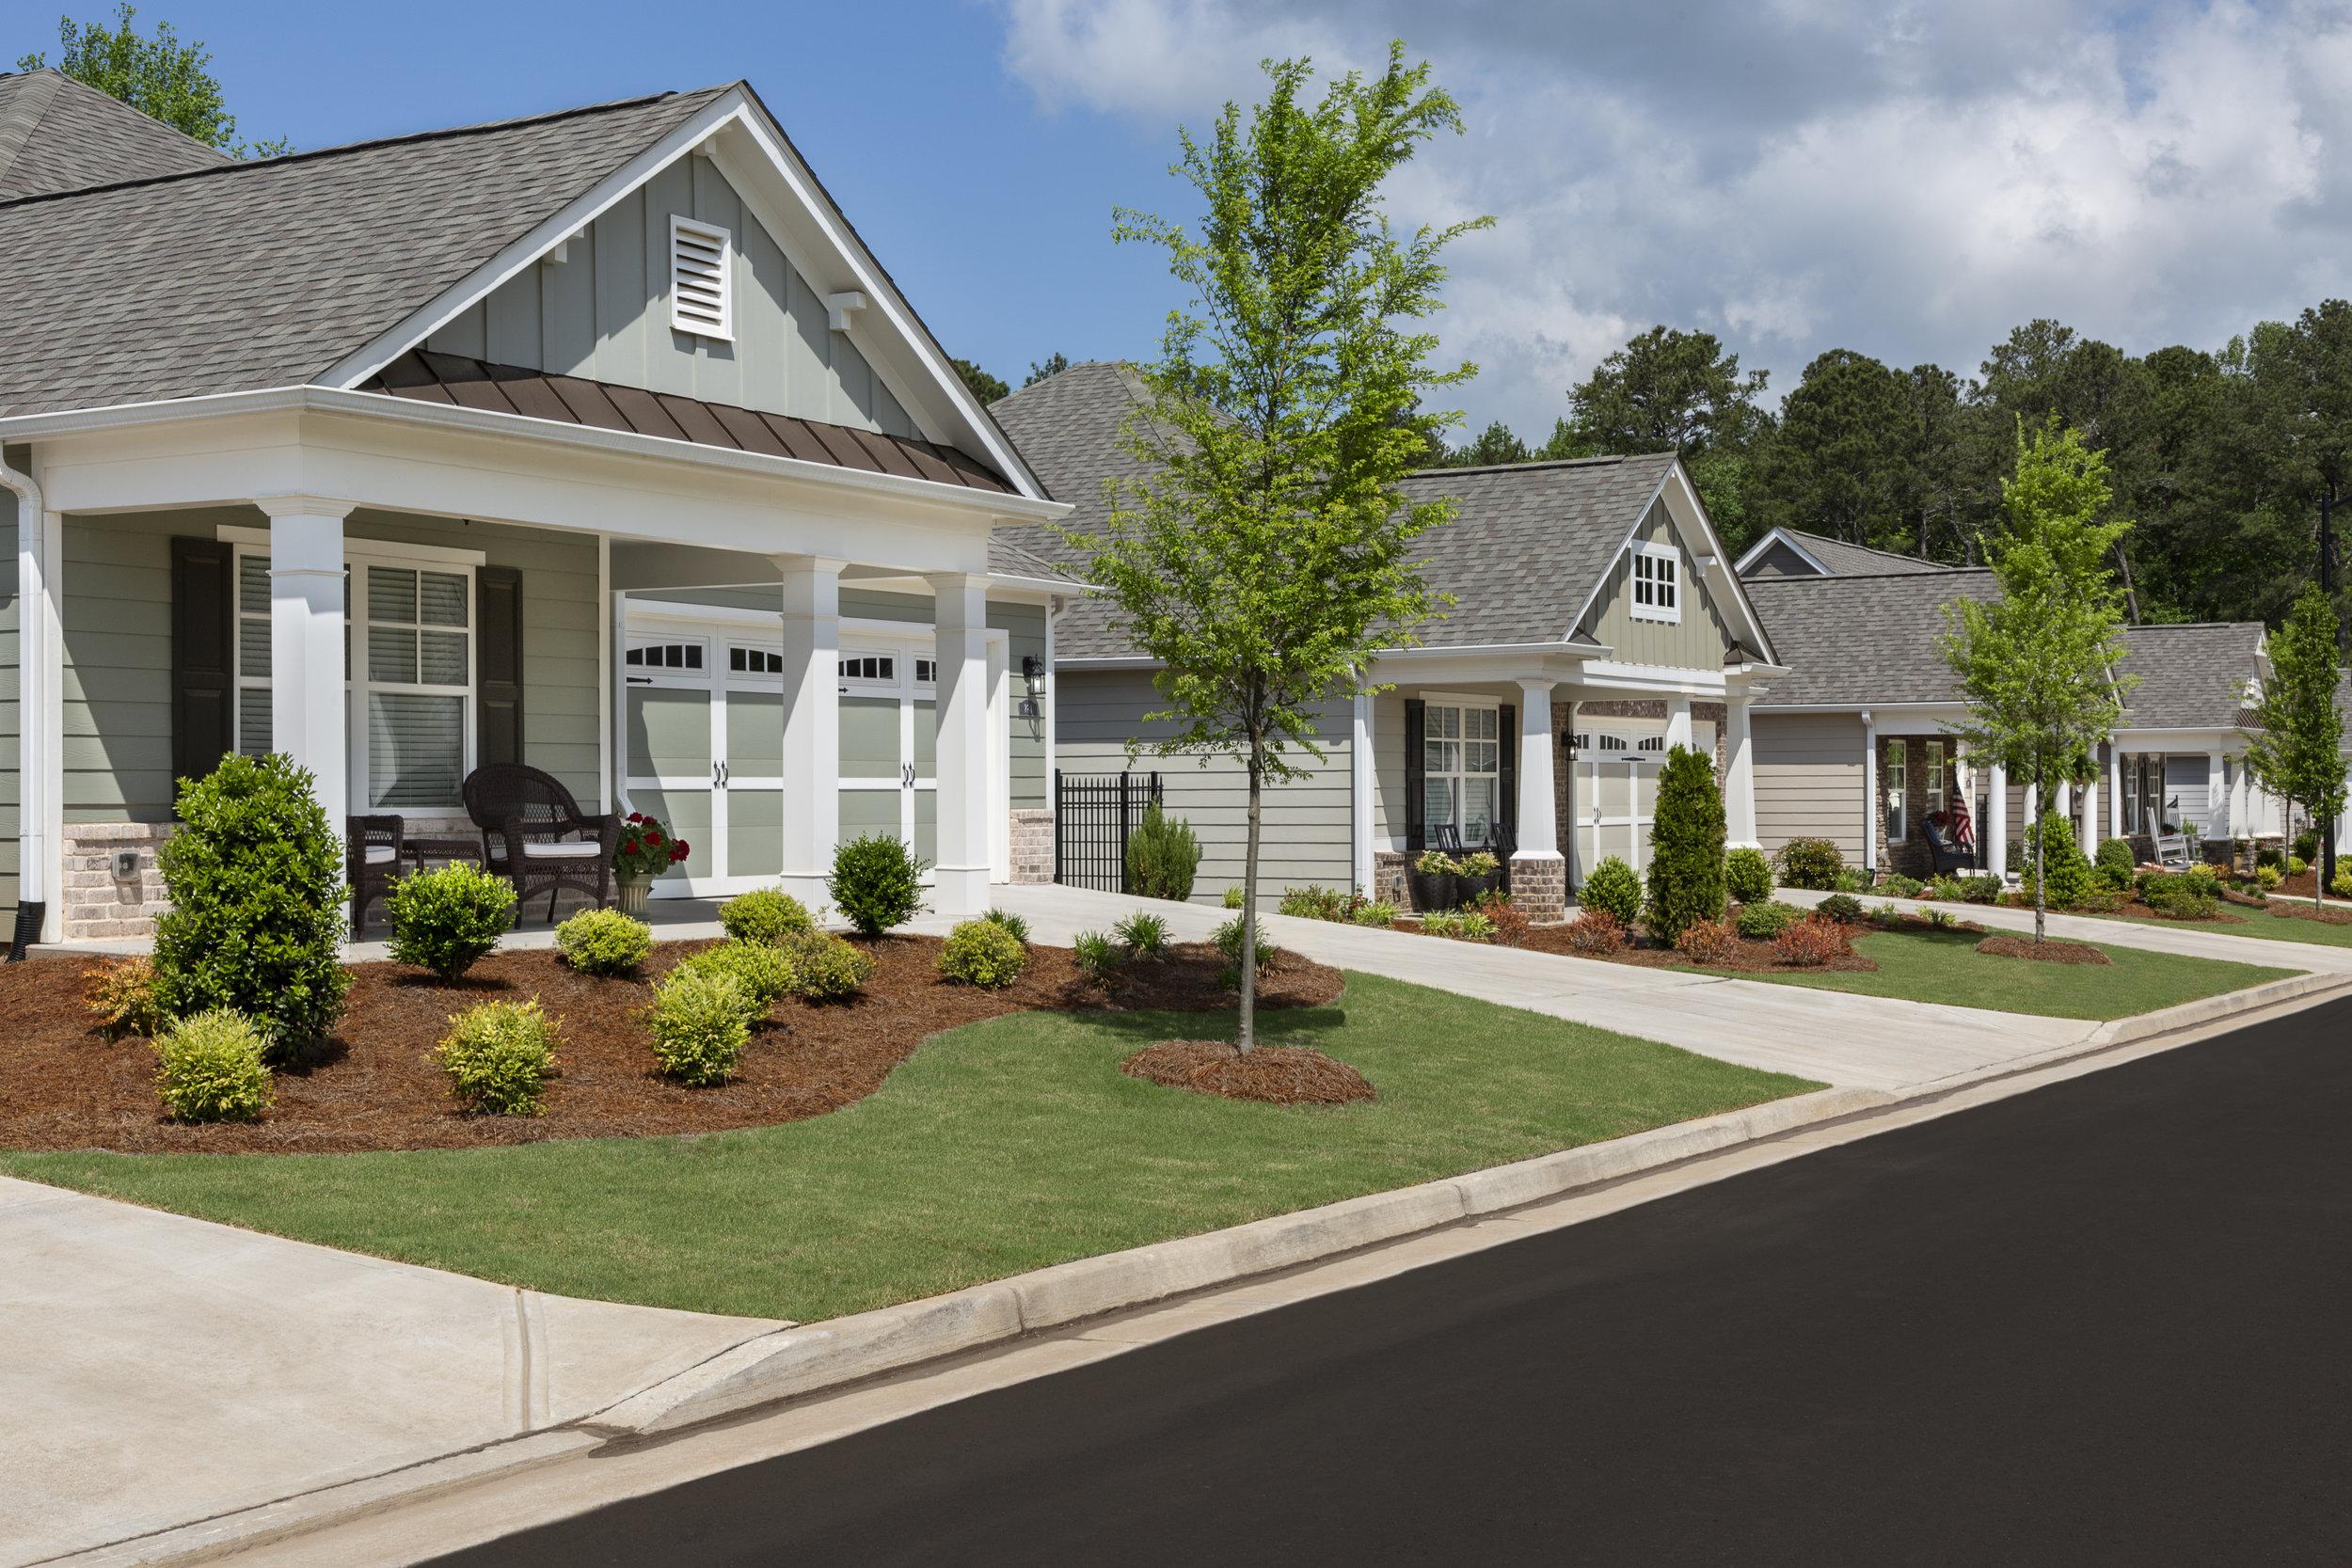 Residential Streetscape for an Atlanta Homebuilder